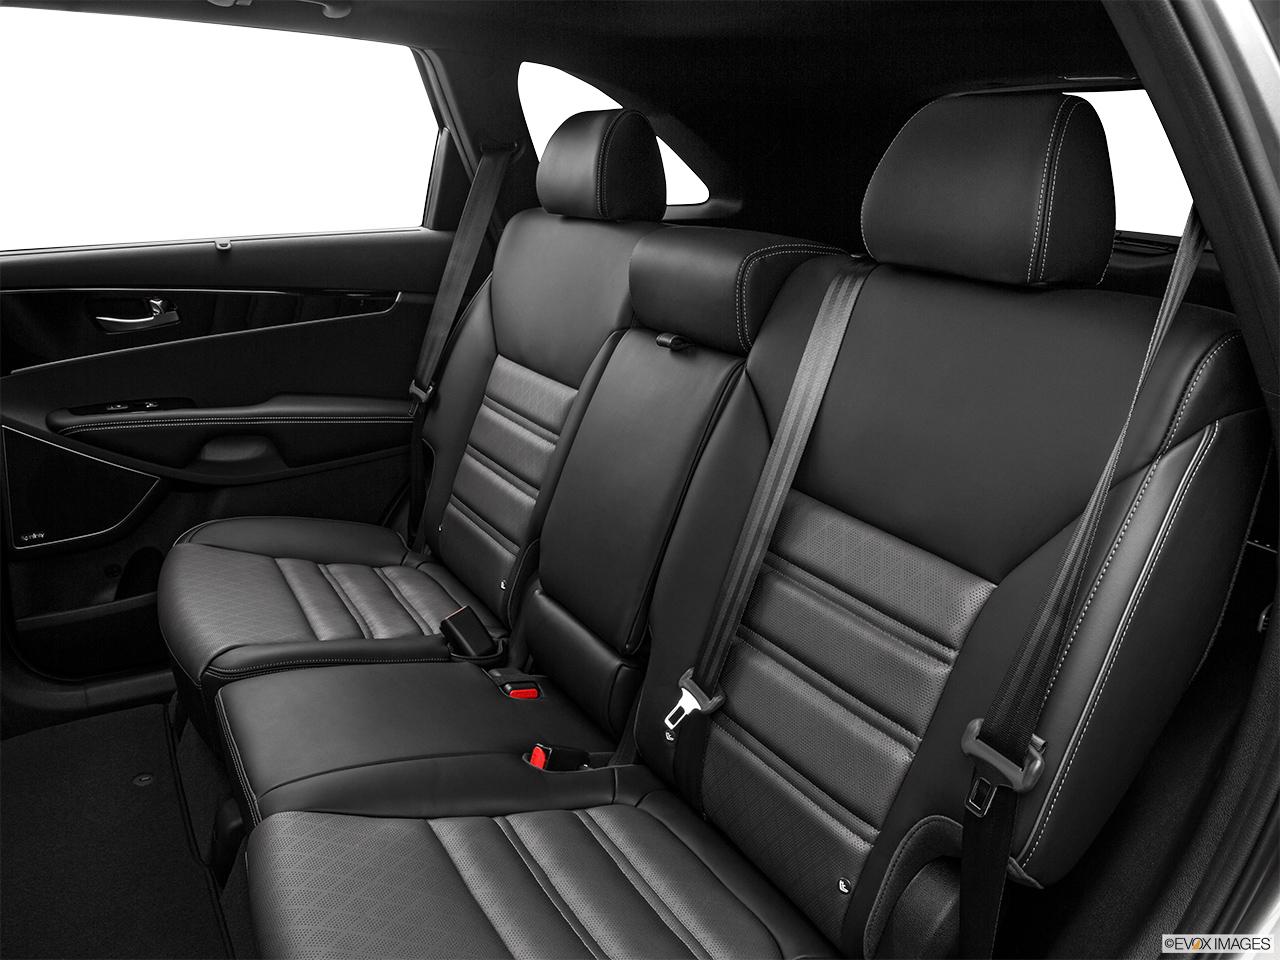 Kia Sorento 2017 3 3l Top Awd In Saudi Arabia New Car Prices Specs Reviews Photos Yallamotor